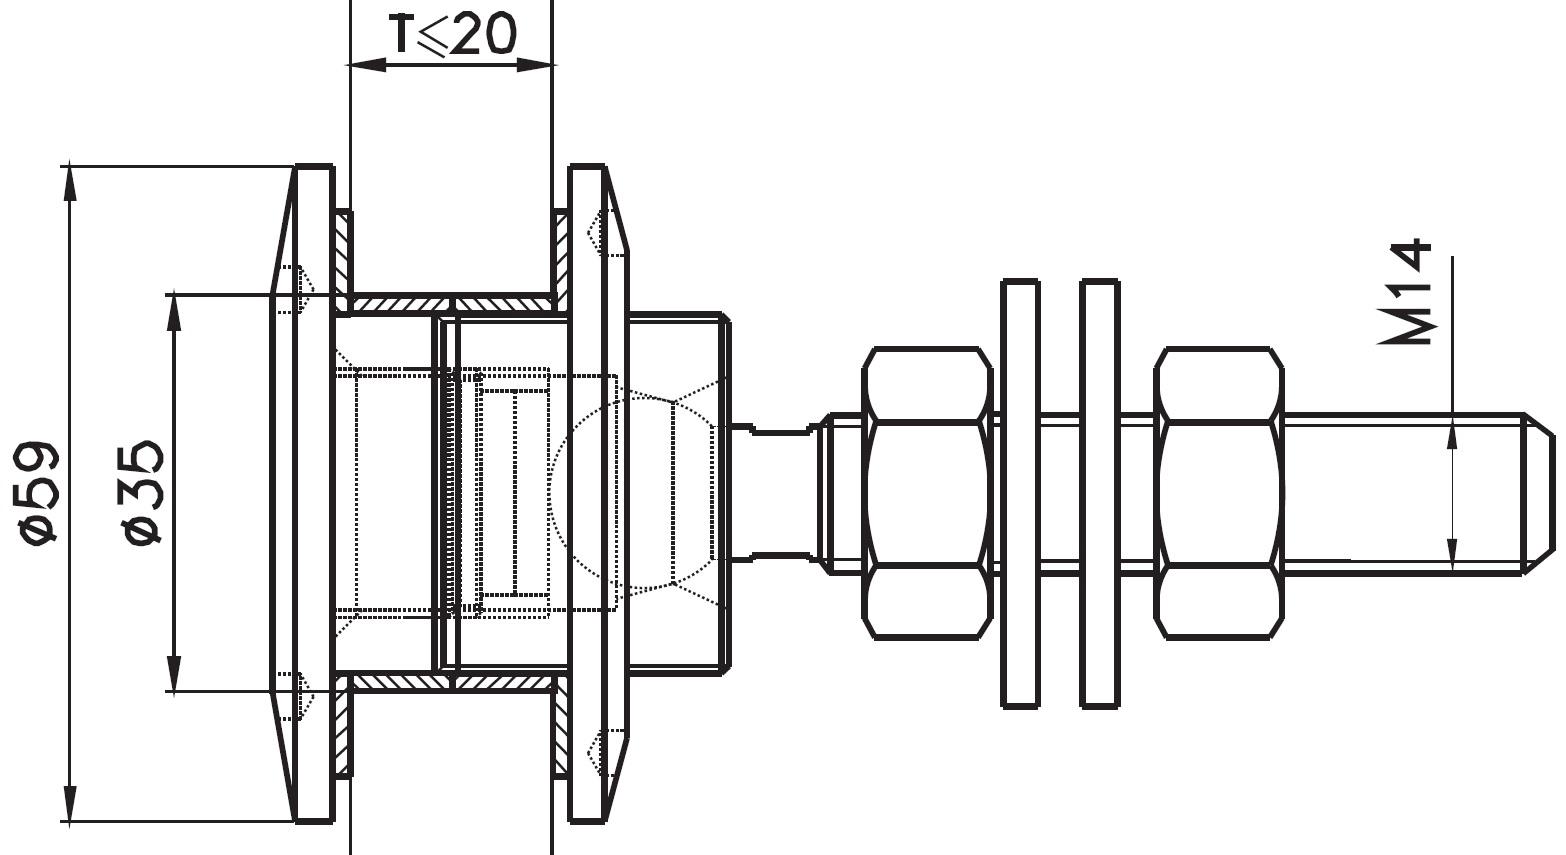 SPRO-60 / GLASS SPIDER FITTING FRONT FIXED Q60 Teknik Çizim